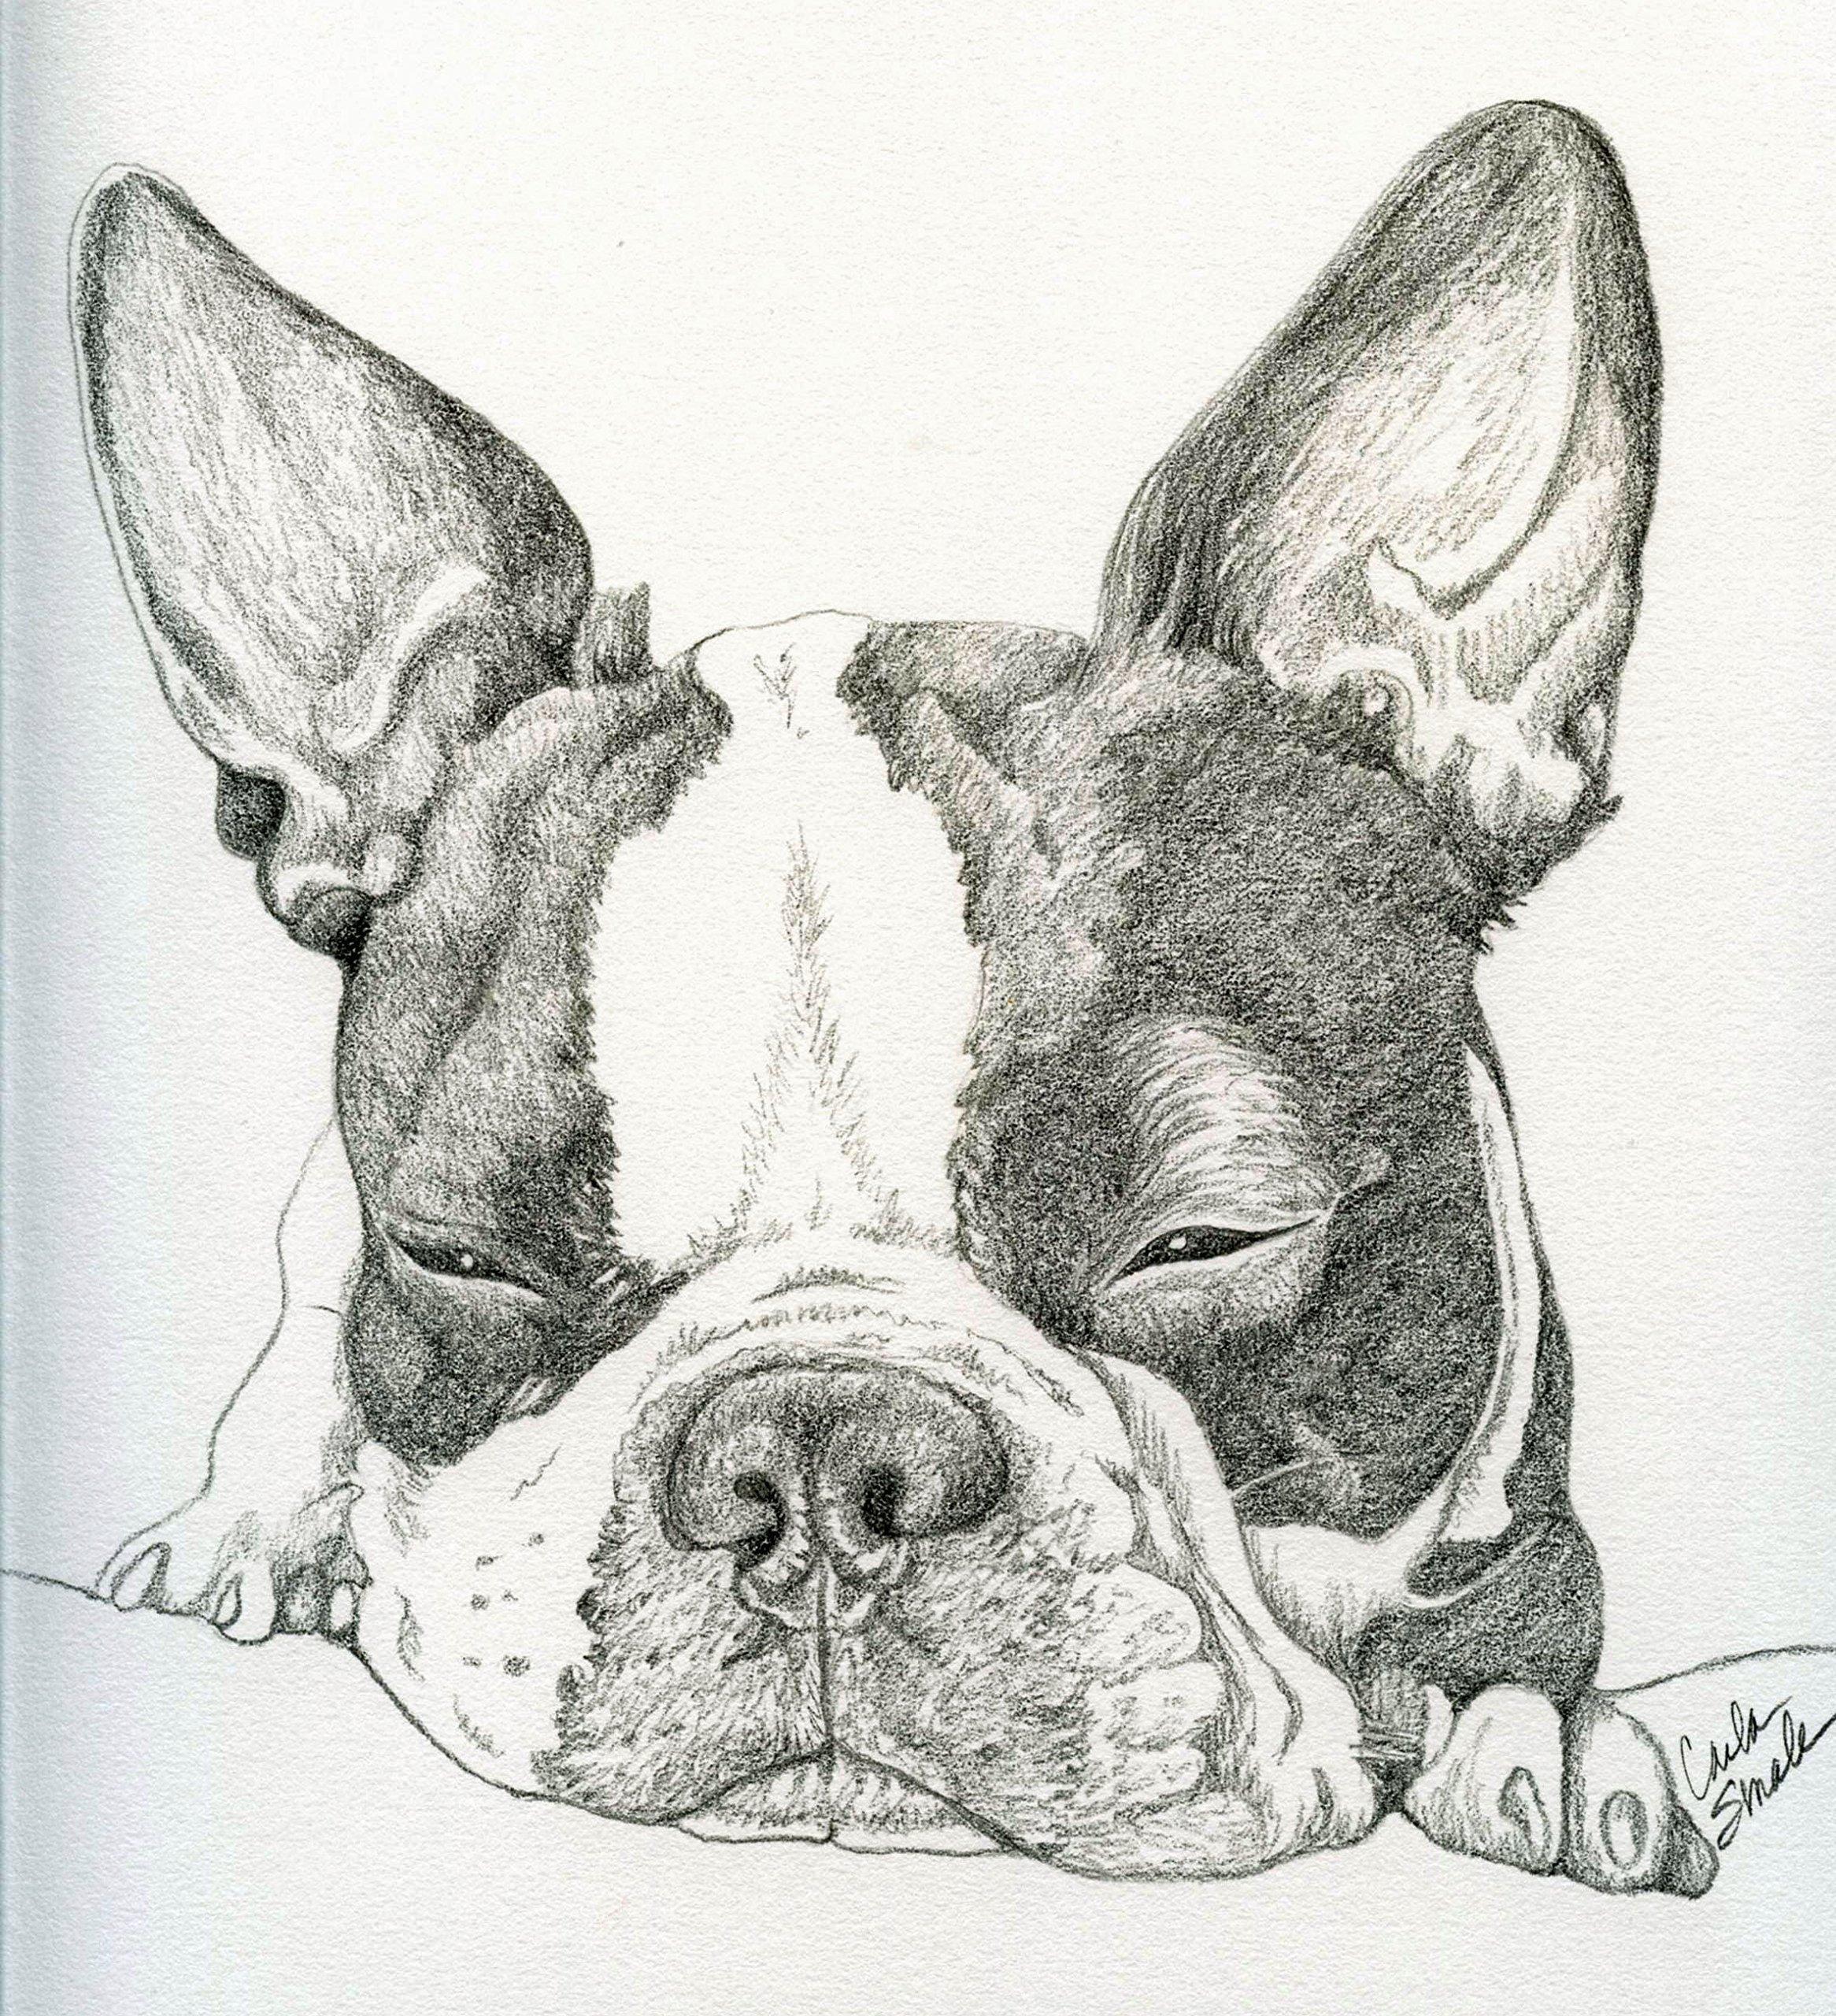 Custom Pet Portrait in Pencil-11 x 14-Carla Smale